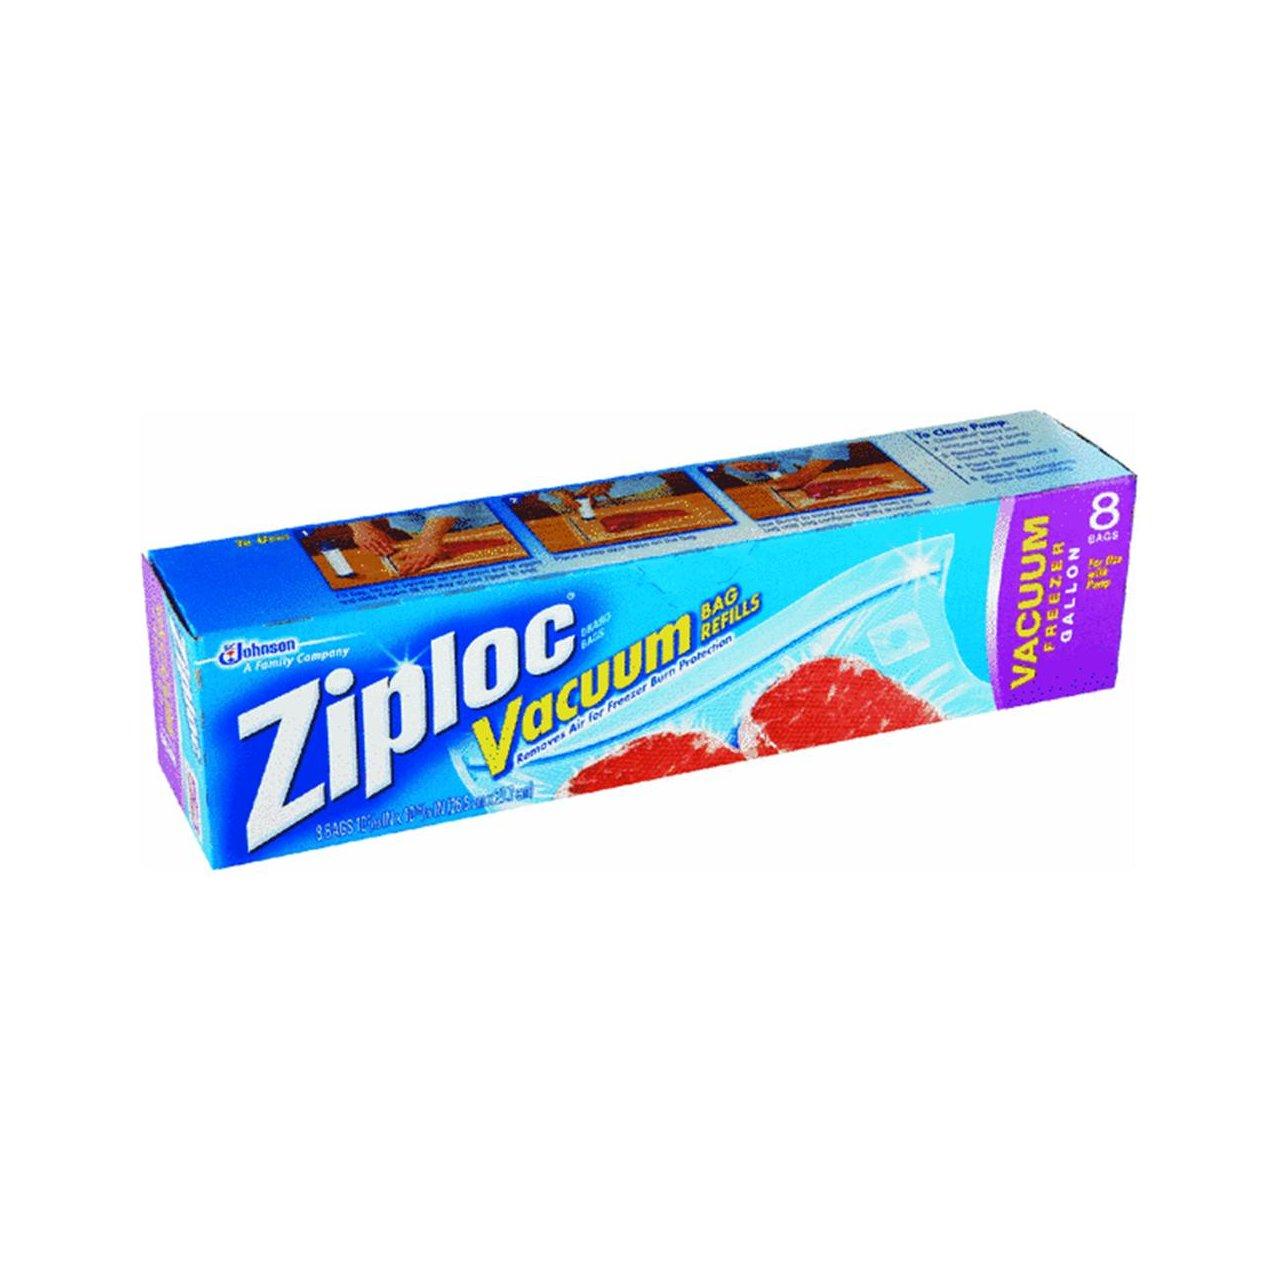 Amazon.com: Caja de 8 bolsas Ziploc para envasar al ...